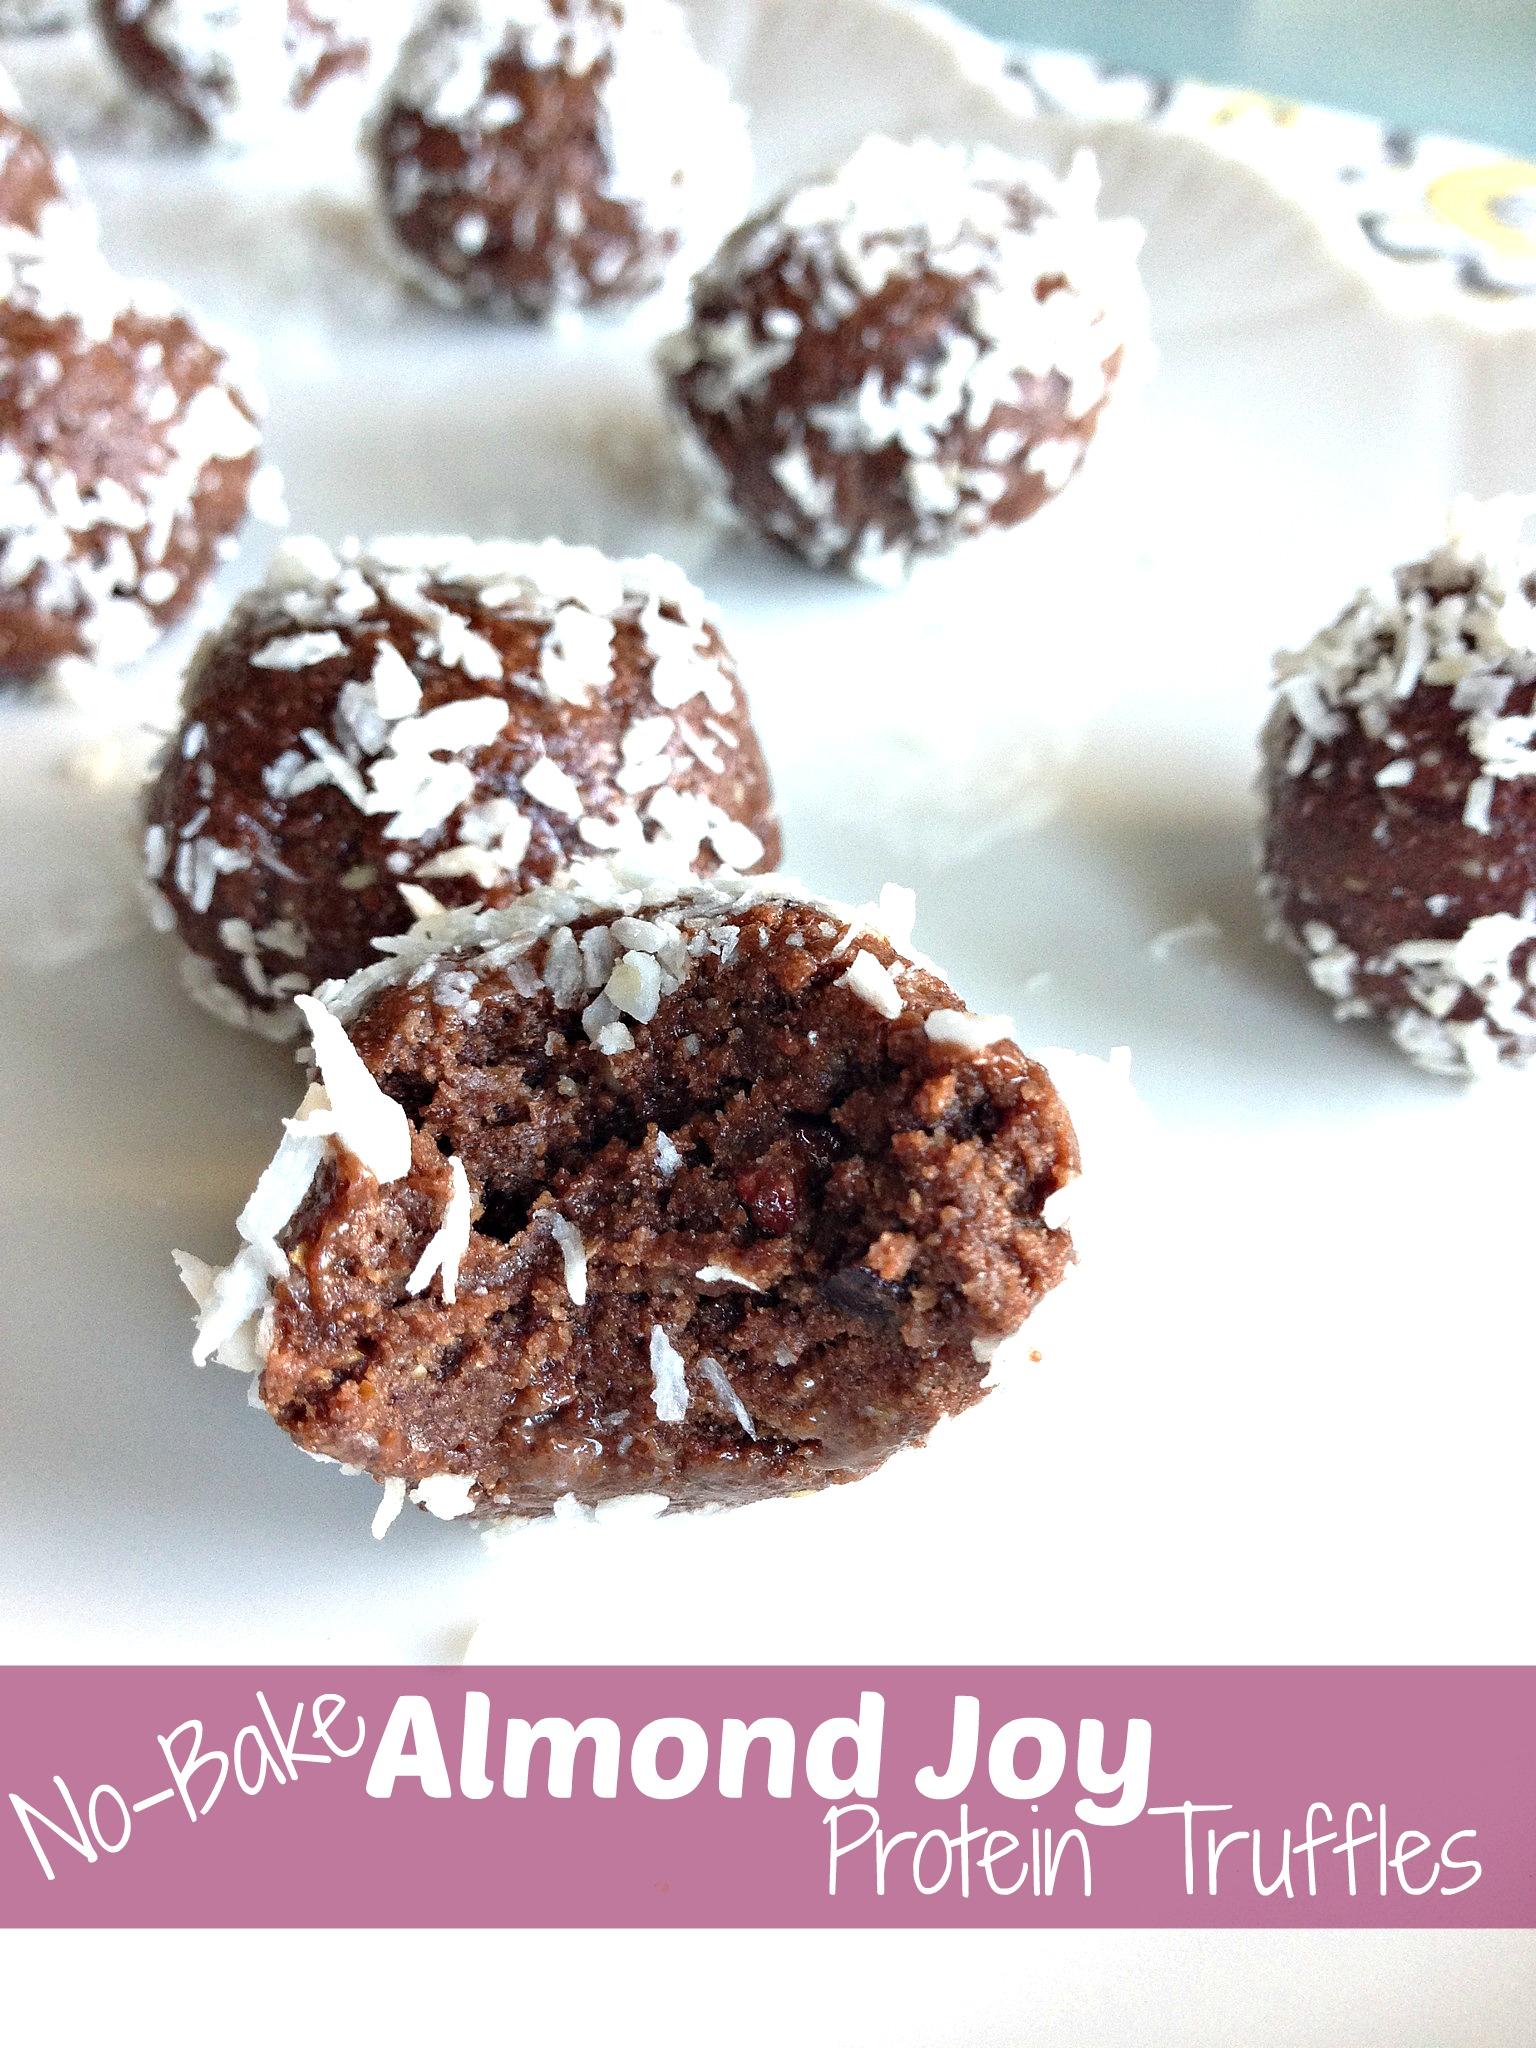 No-Bake Almond Joy Protein Truffles